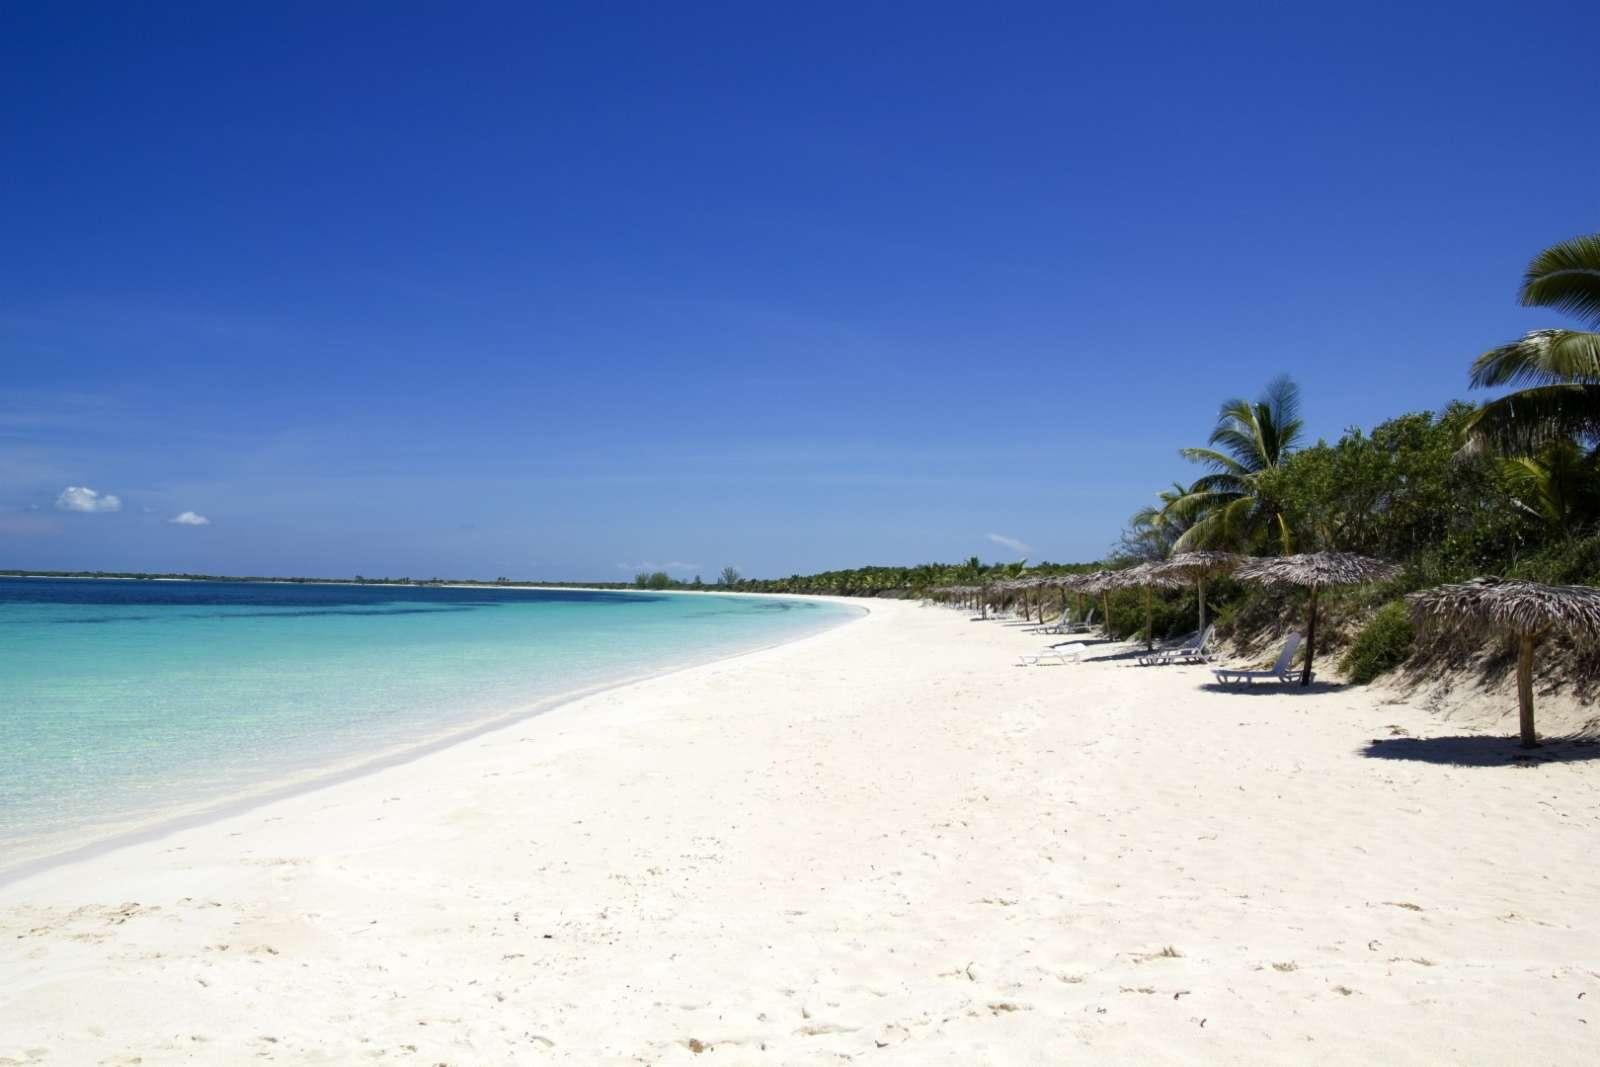 Beach at Cayos de Villa Clara